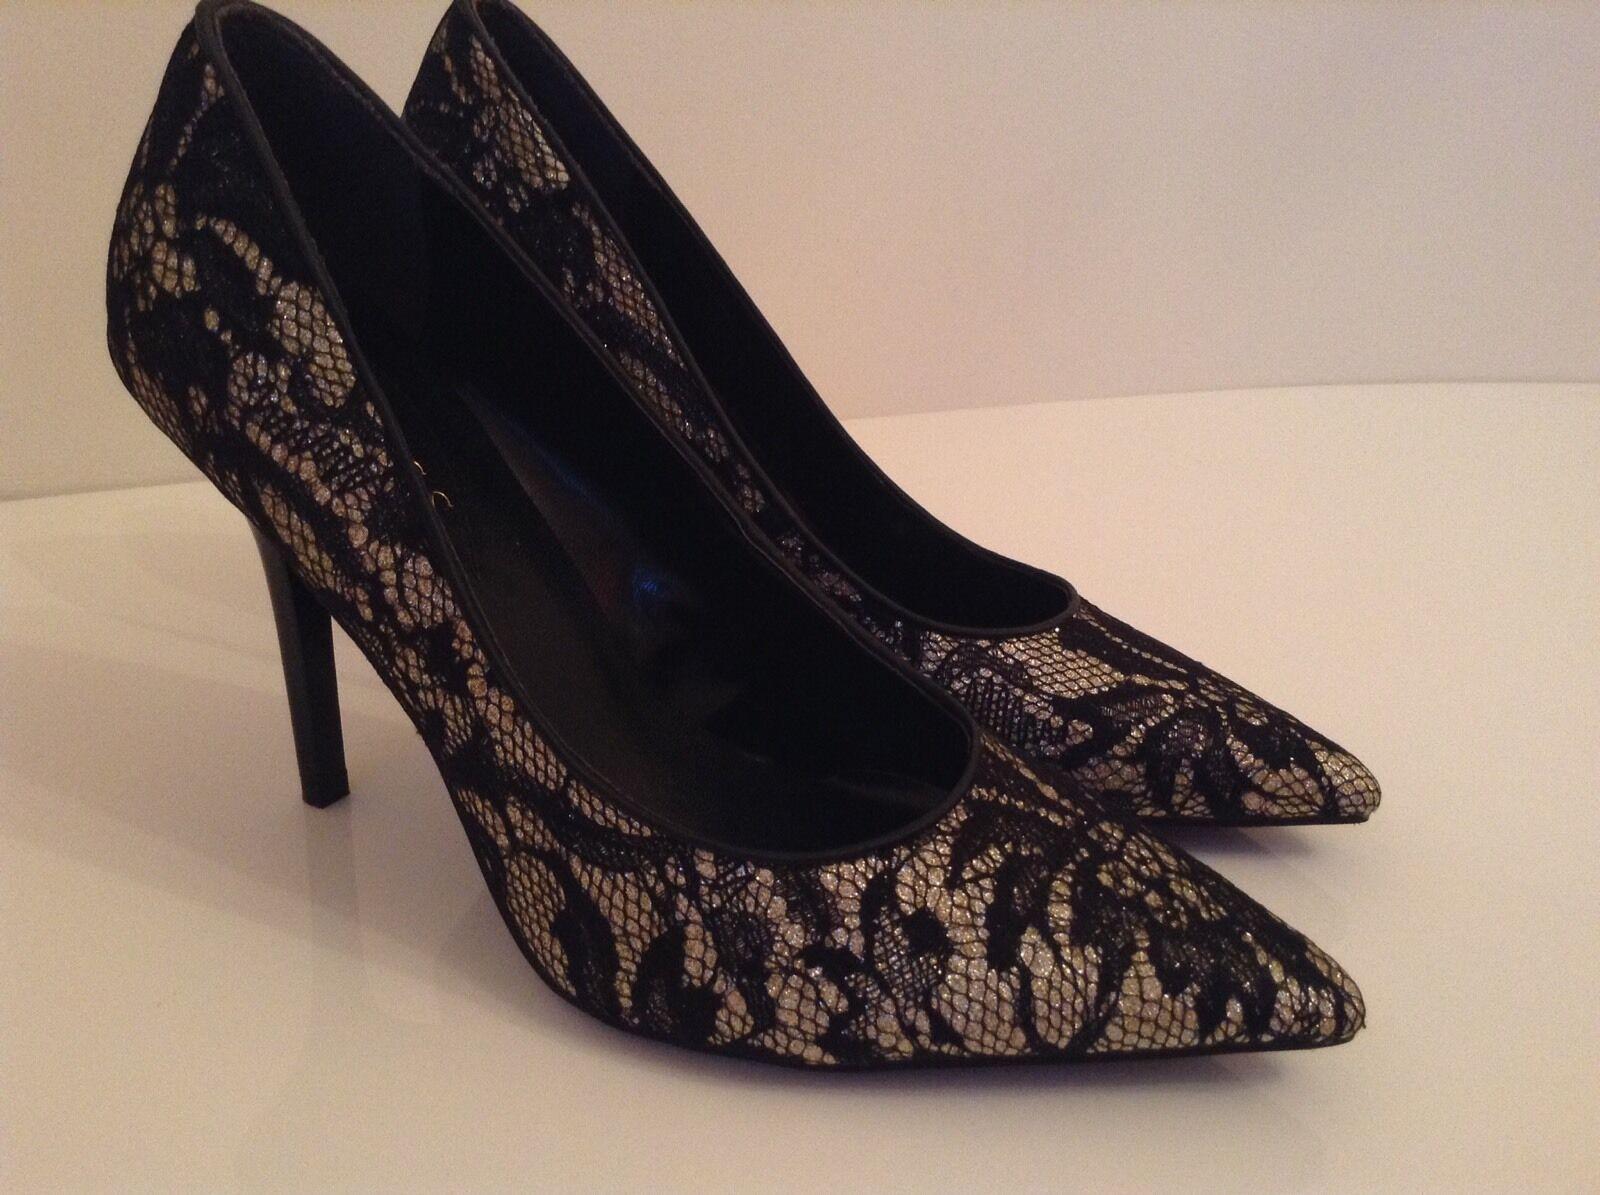 BNWTB 100% auth Guess stiletto schwarz Laced heels. UK 8